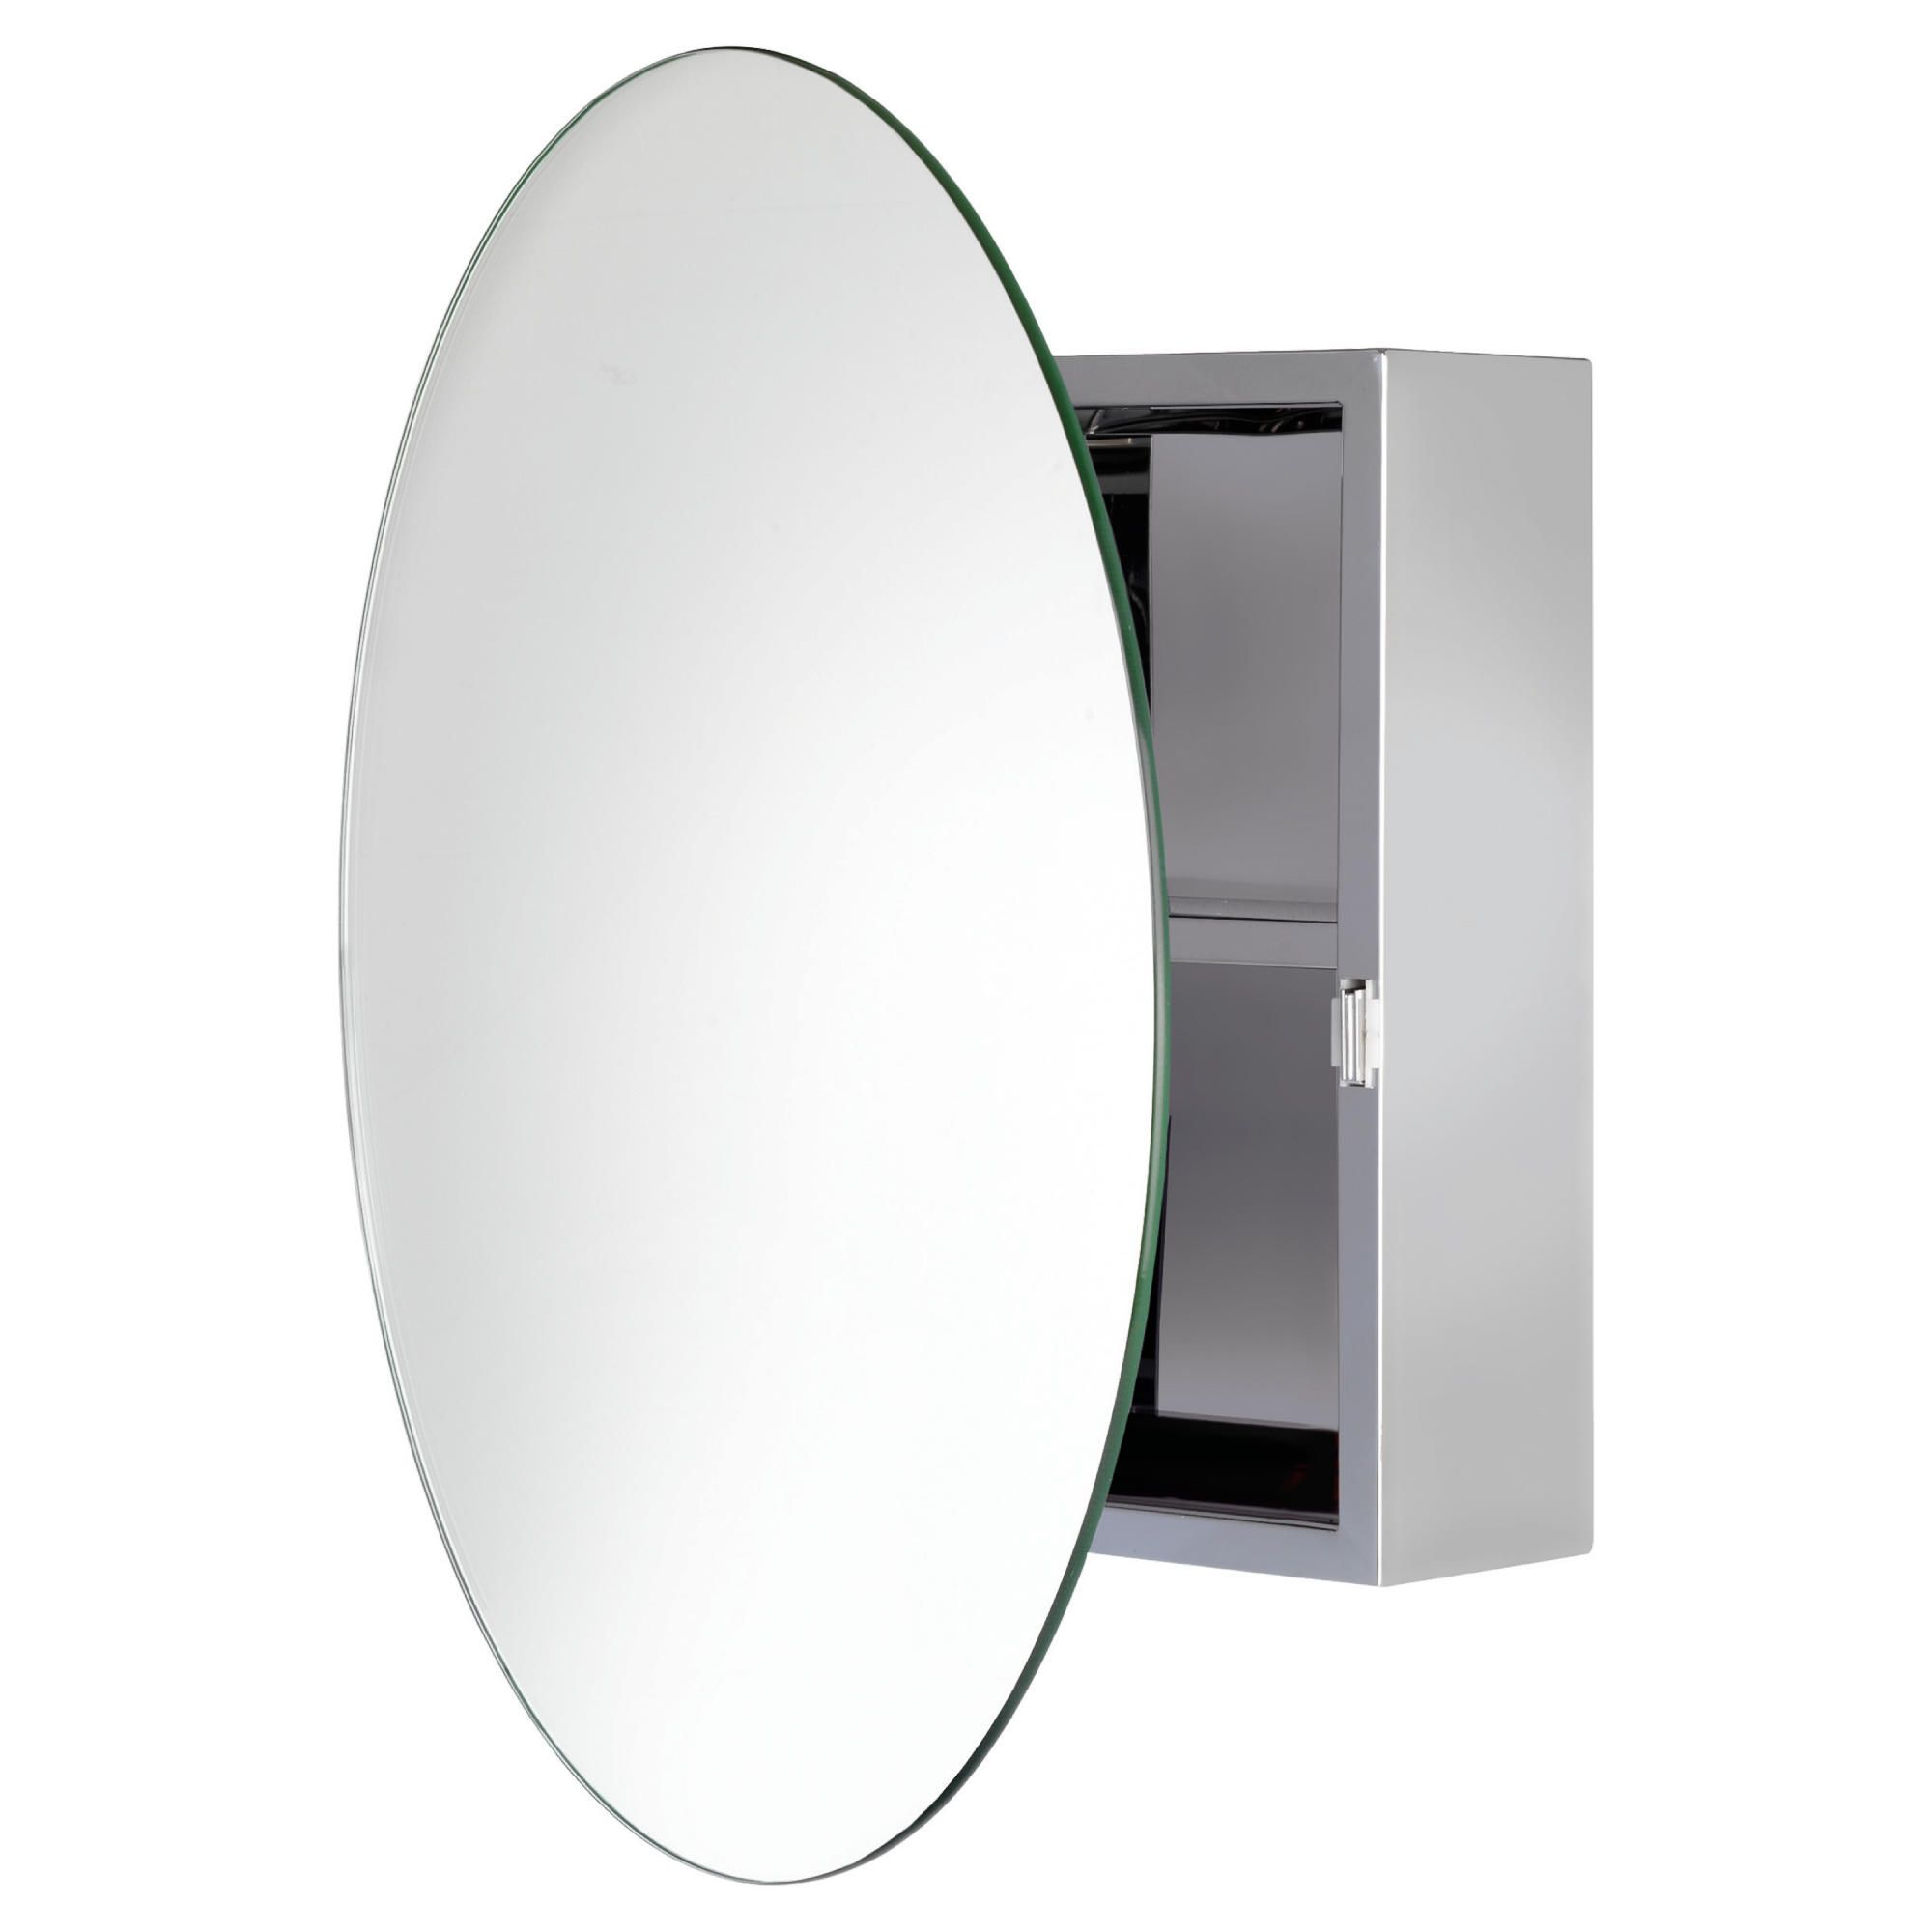 Croydex Stainless Steel Circular Mirror Cabinet